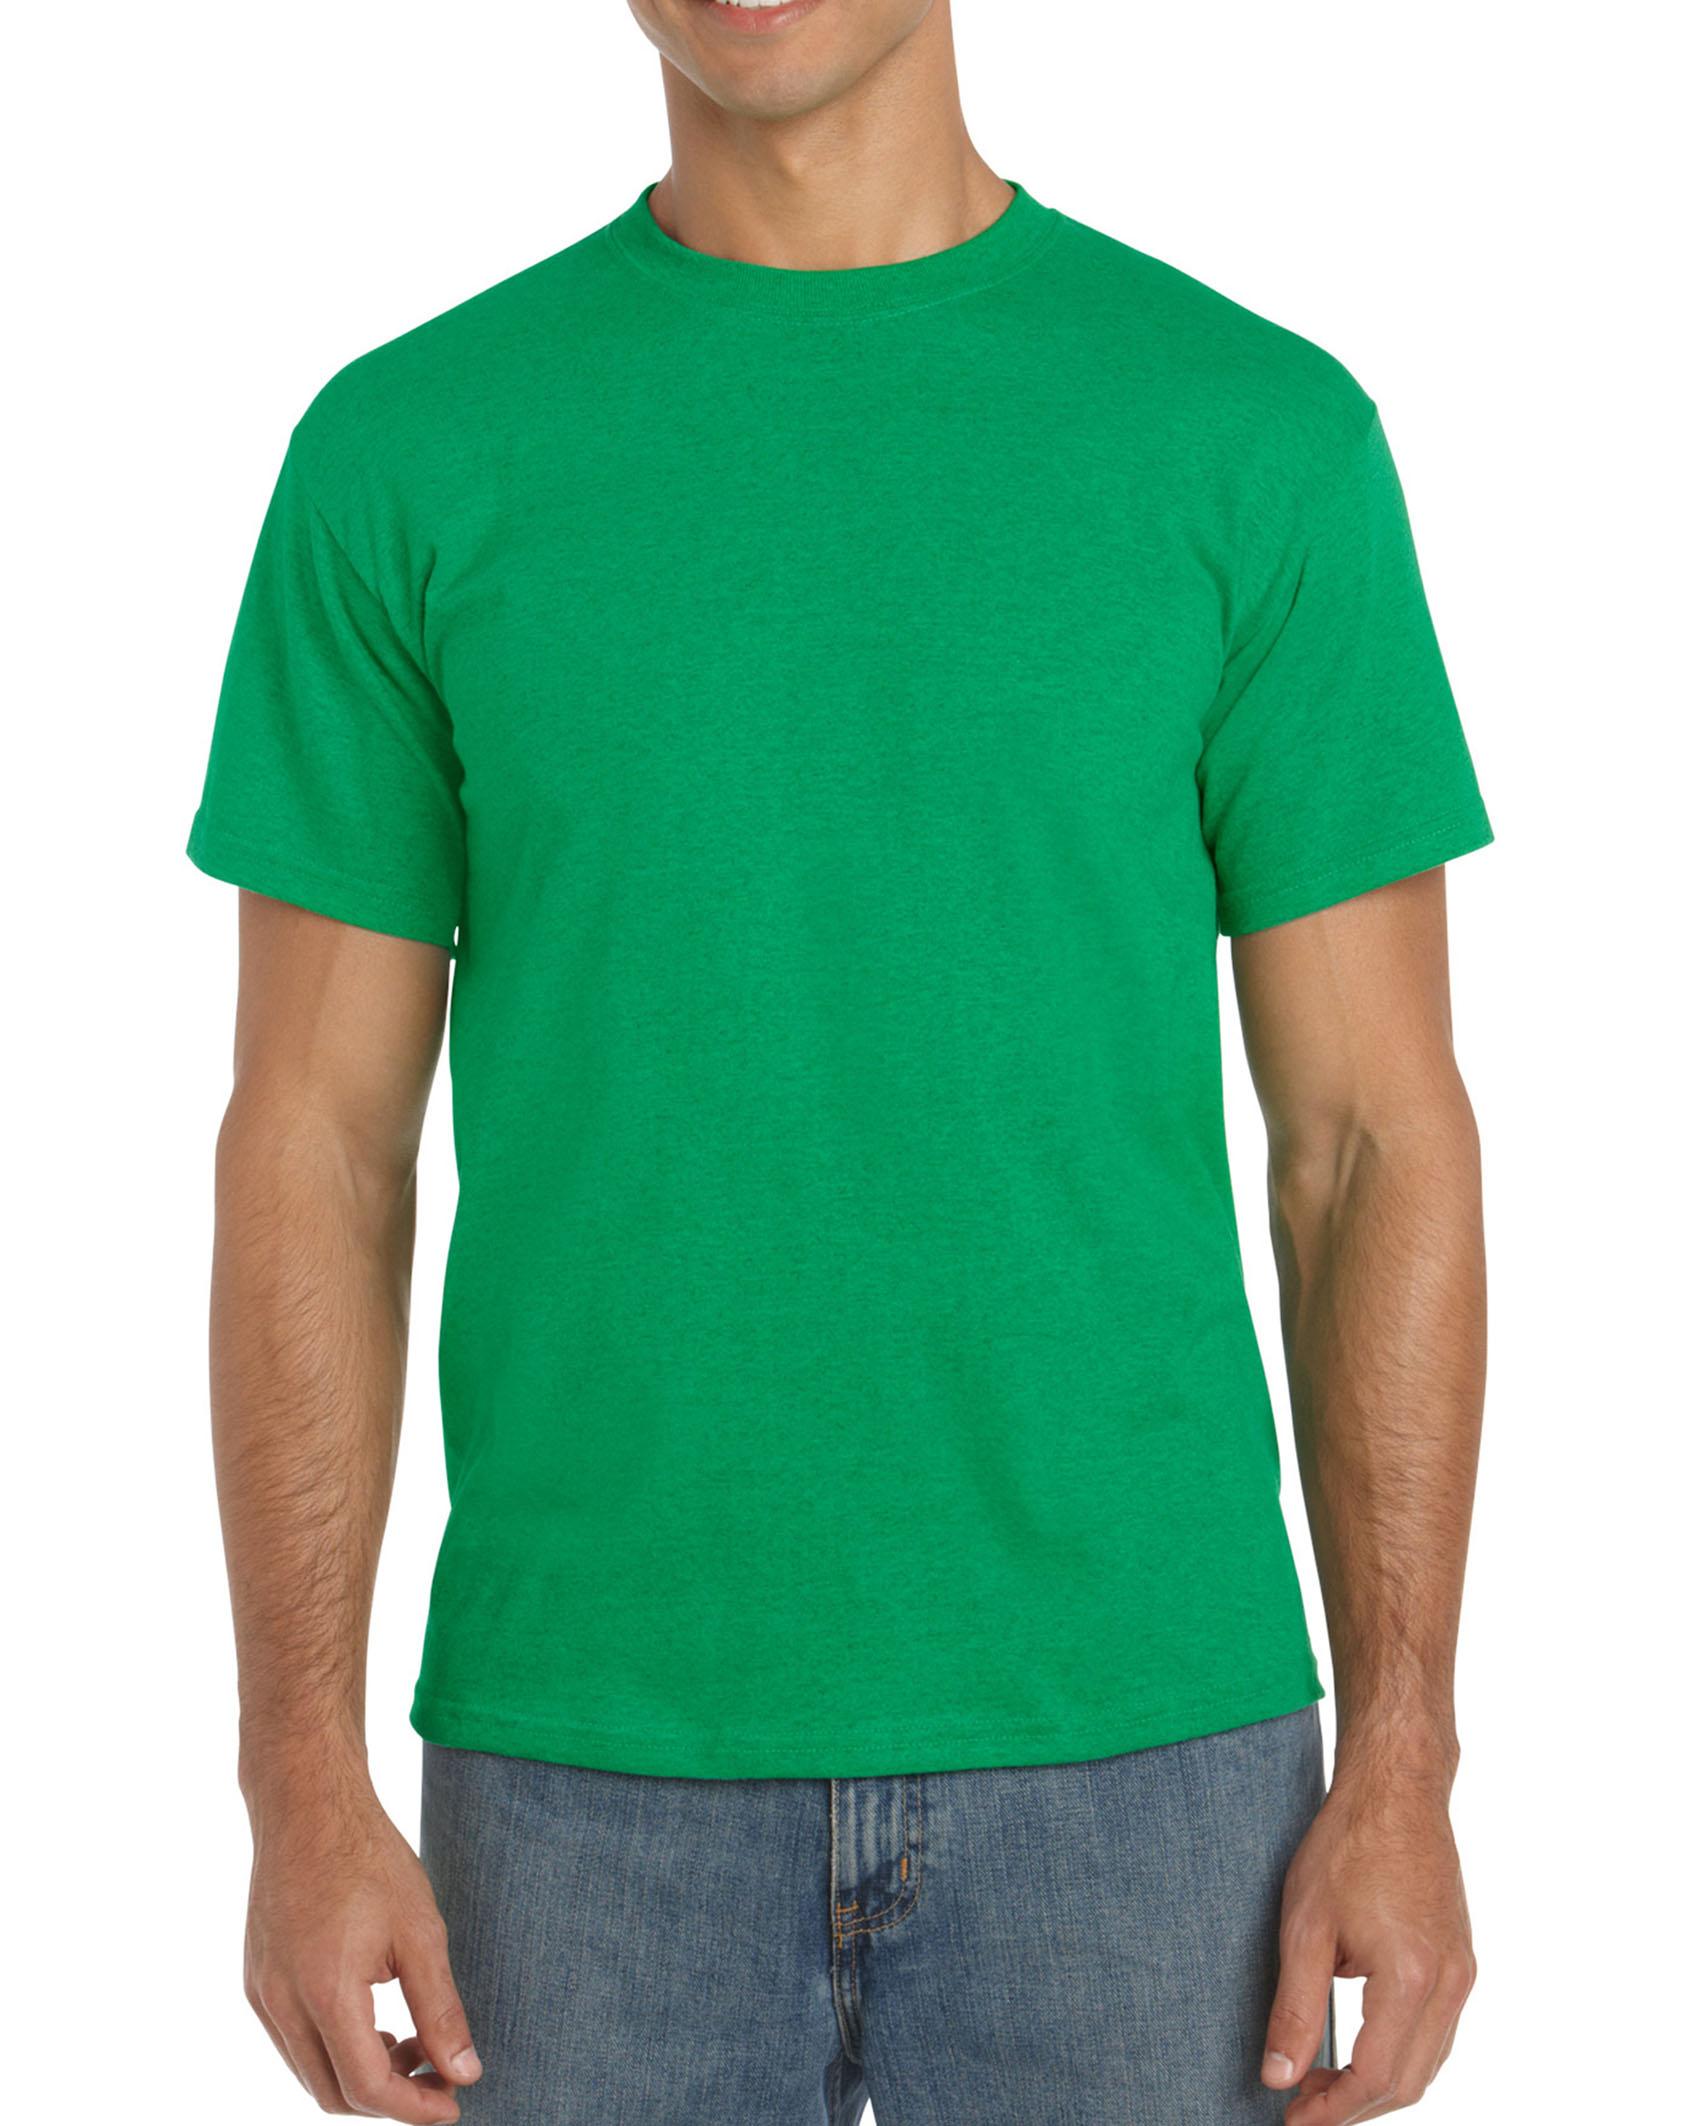 antique irish green